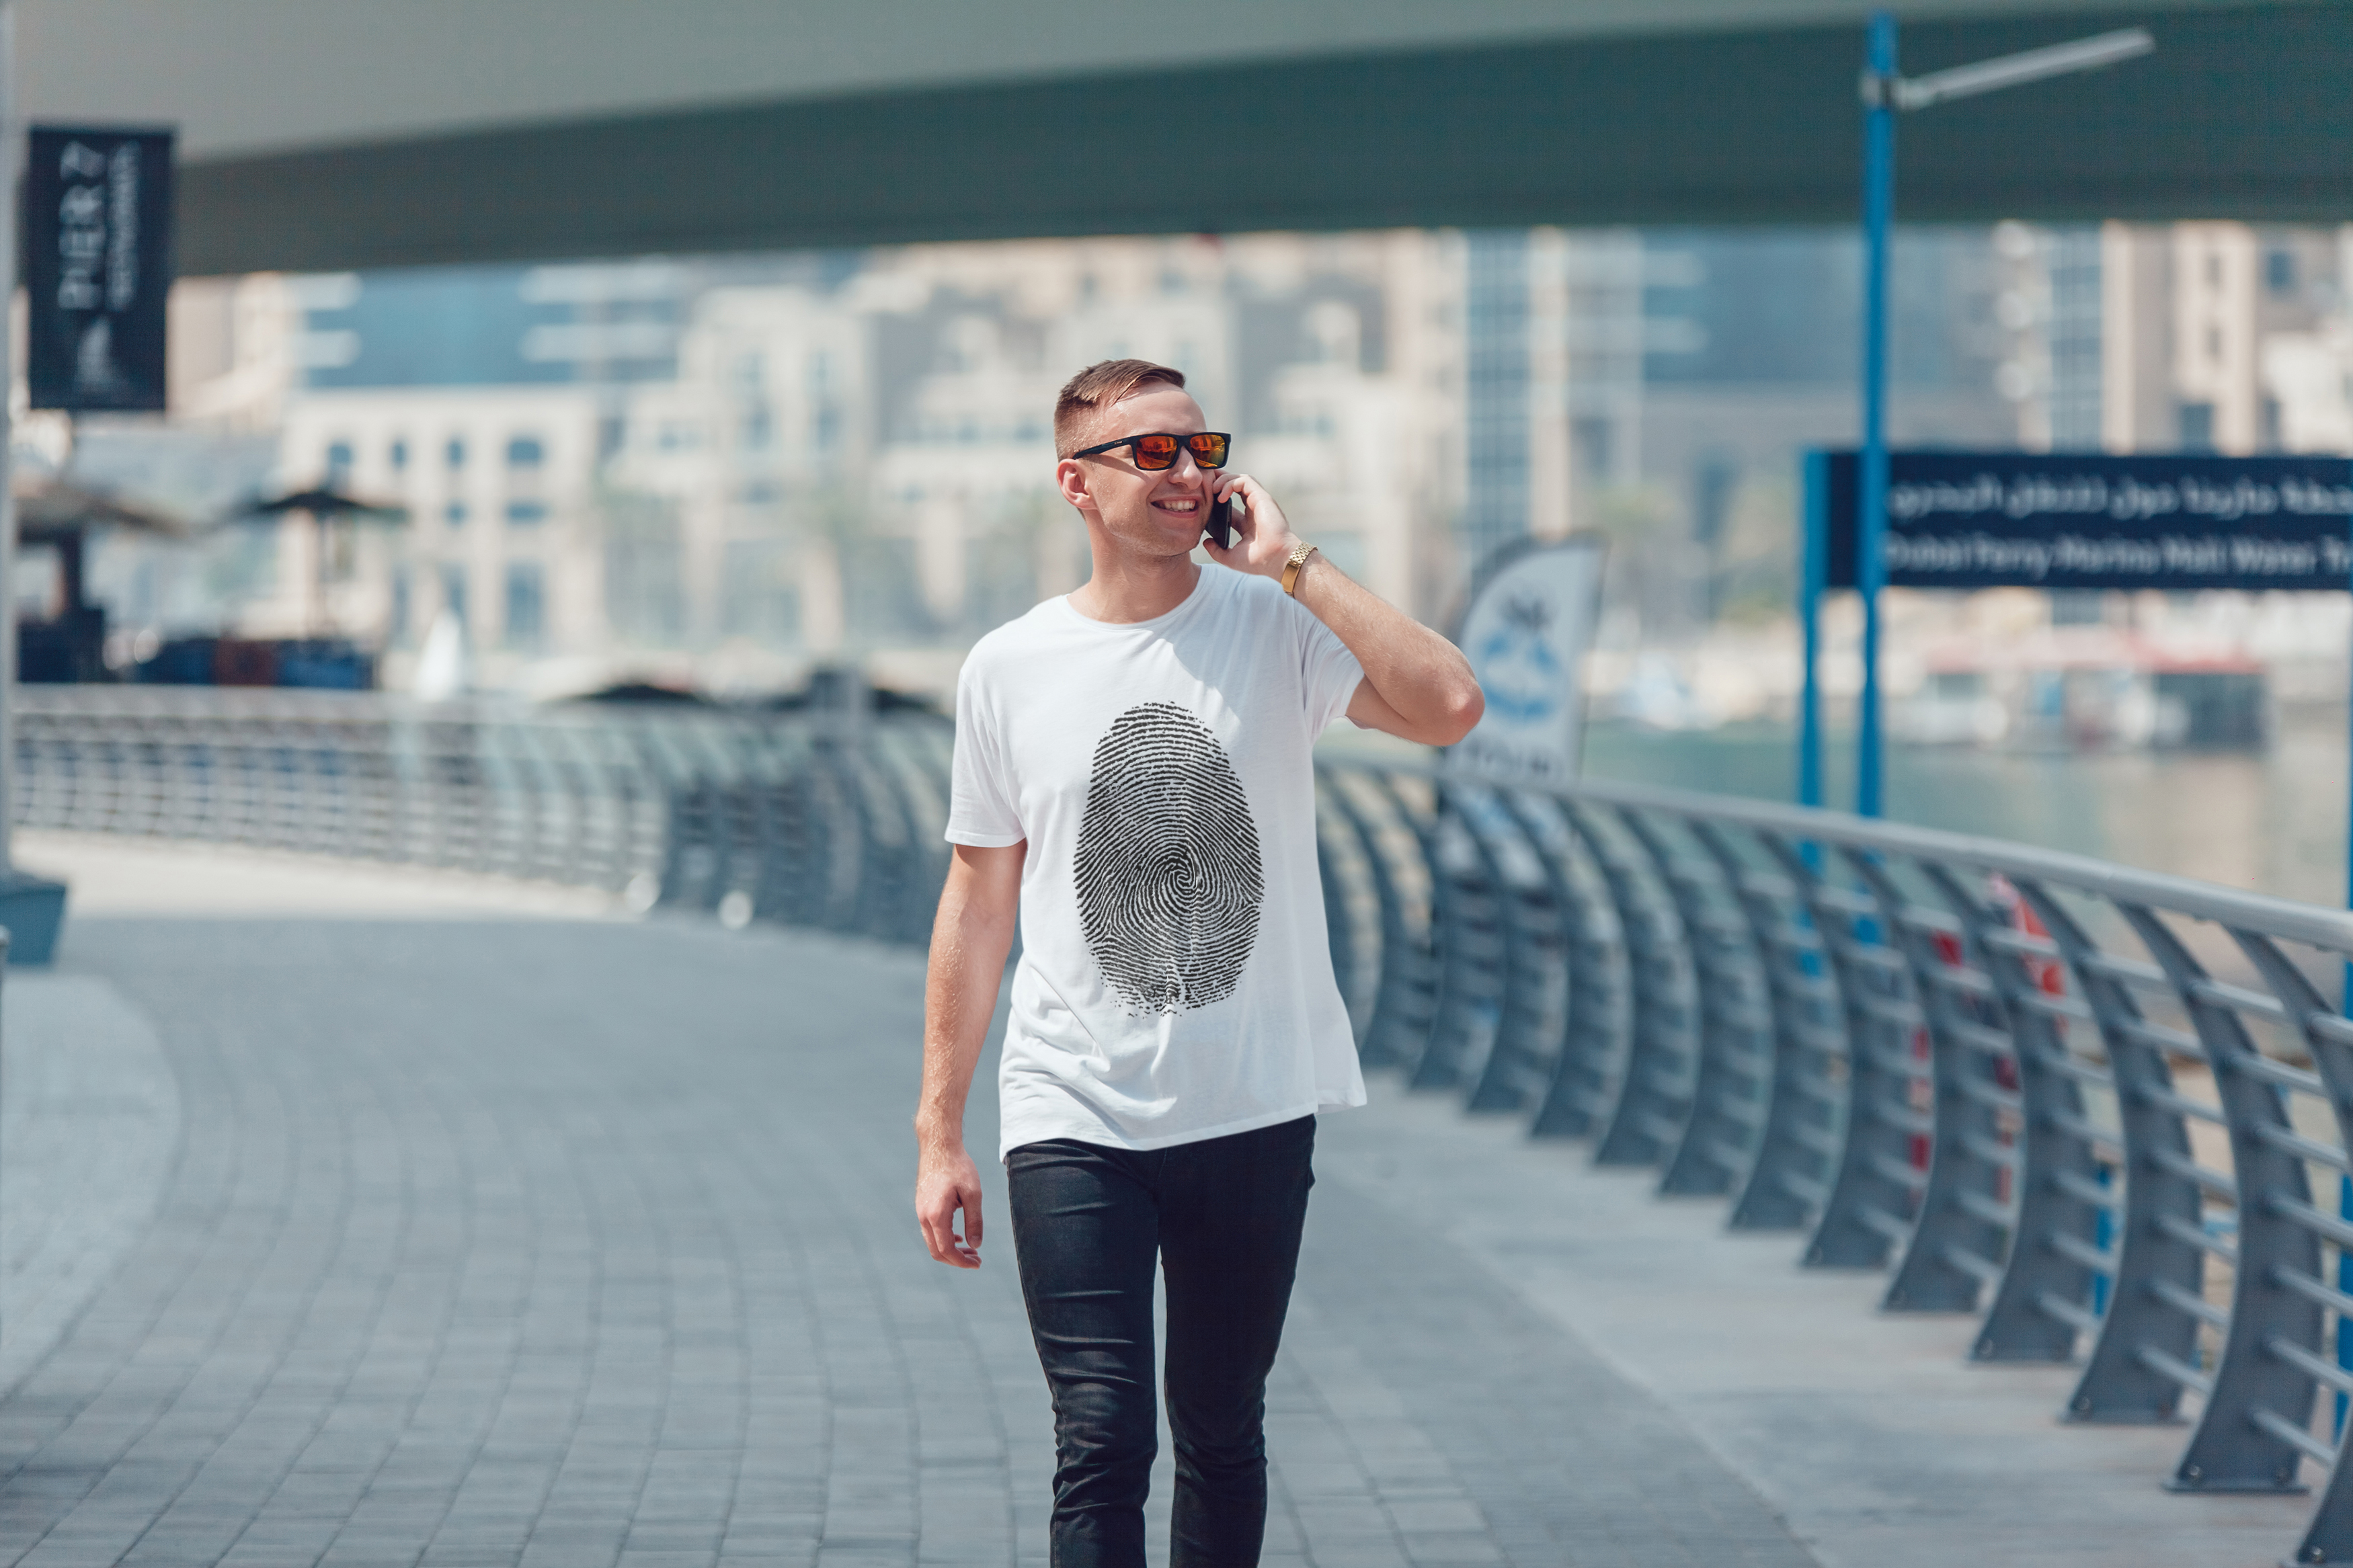 Men's T-Shirt Mock-Up Vol.5 2017 example image 10